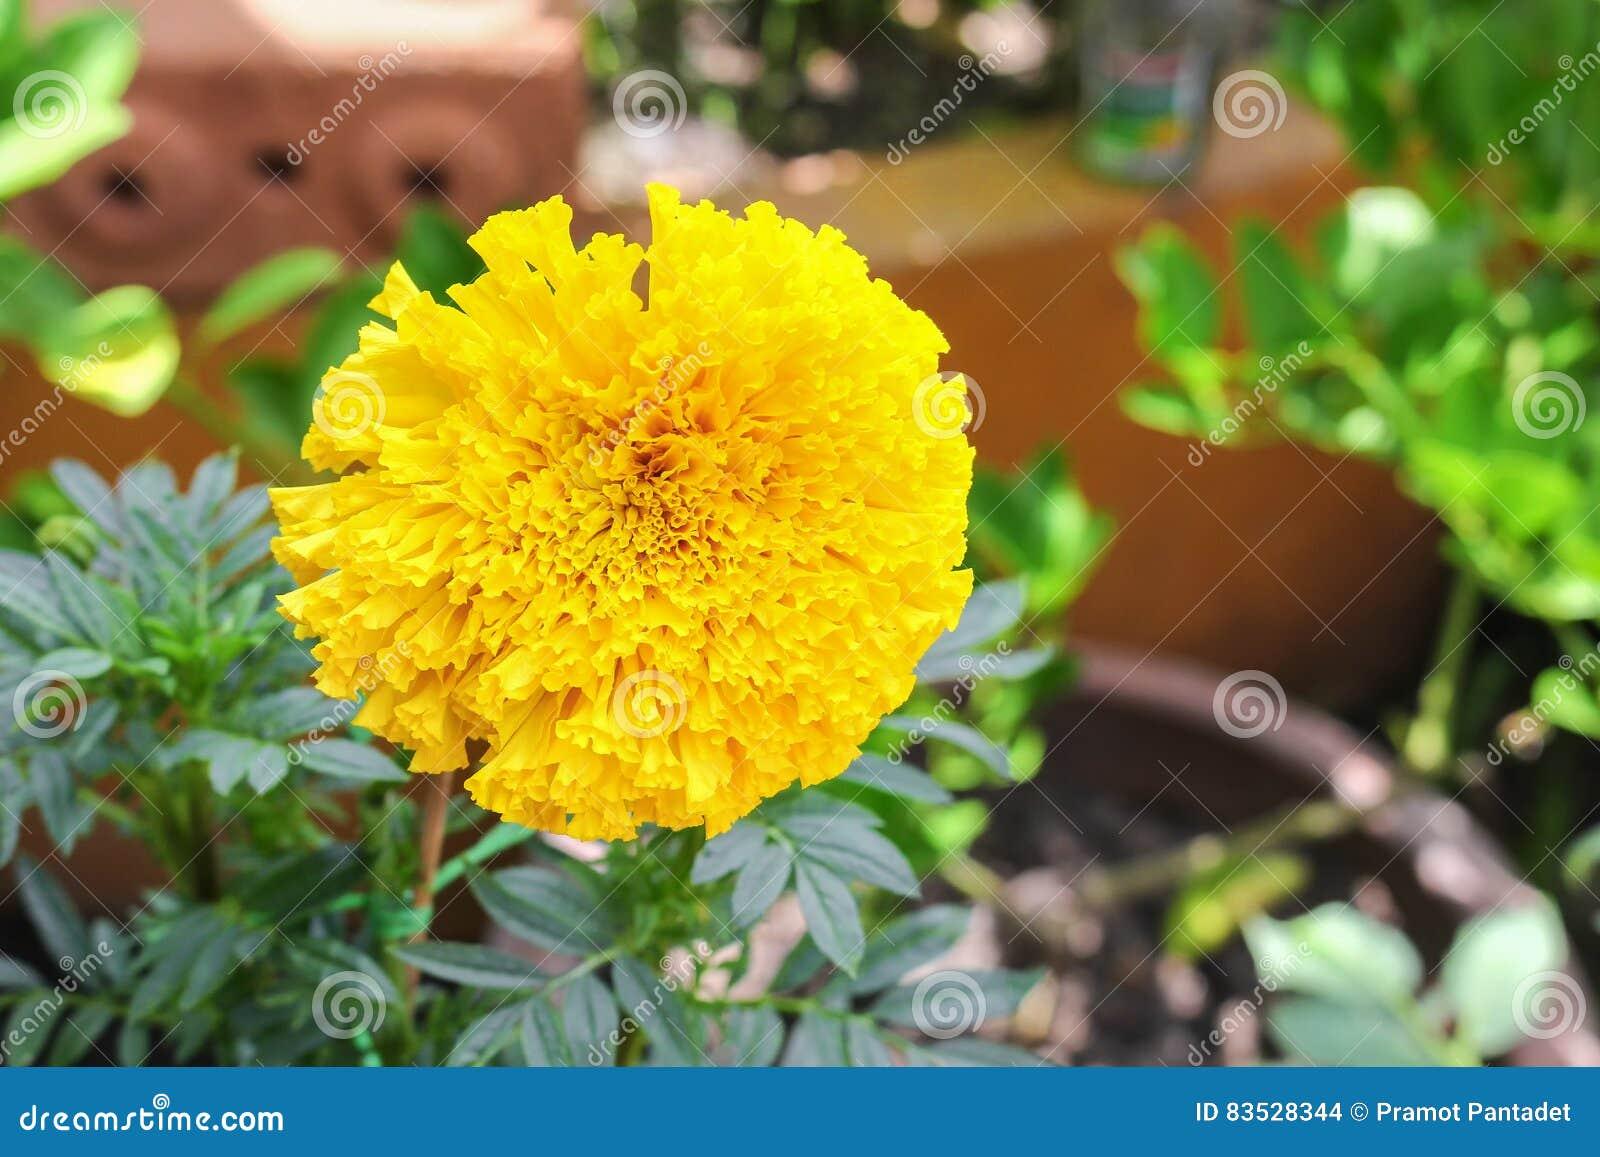 Marigold yellow flowers beautiful marigold india flower stock photo download marigold yellow flowers beautiful marigold india flower stock photo image of flower mightylinksfo